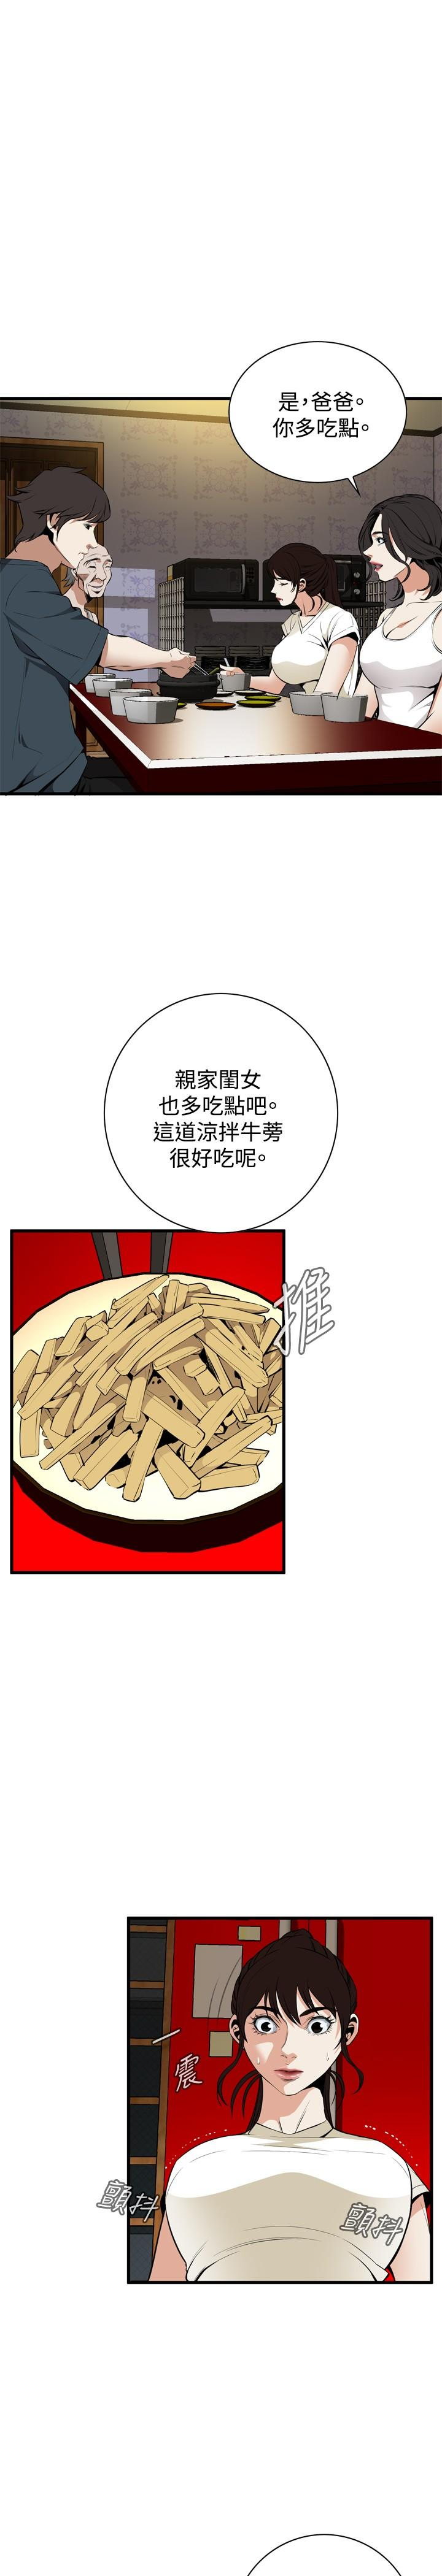 Take a Peek 偷窥 Ch.39~51 [Chinese]中文 138